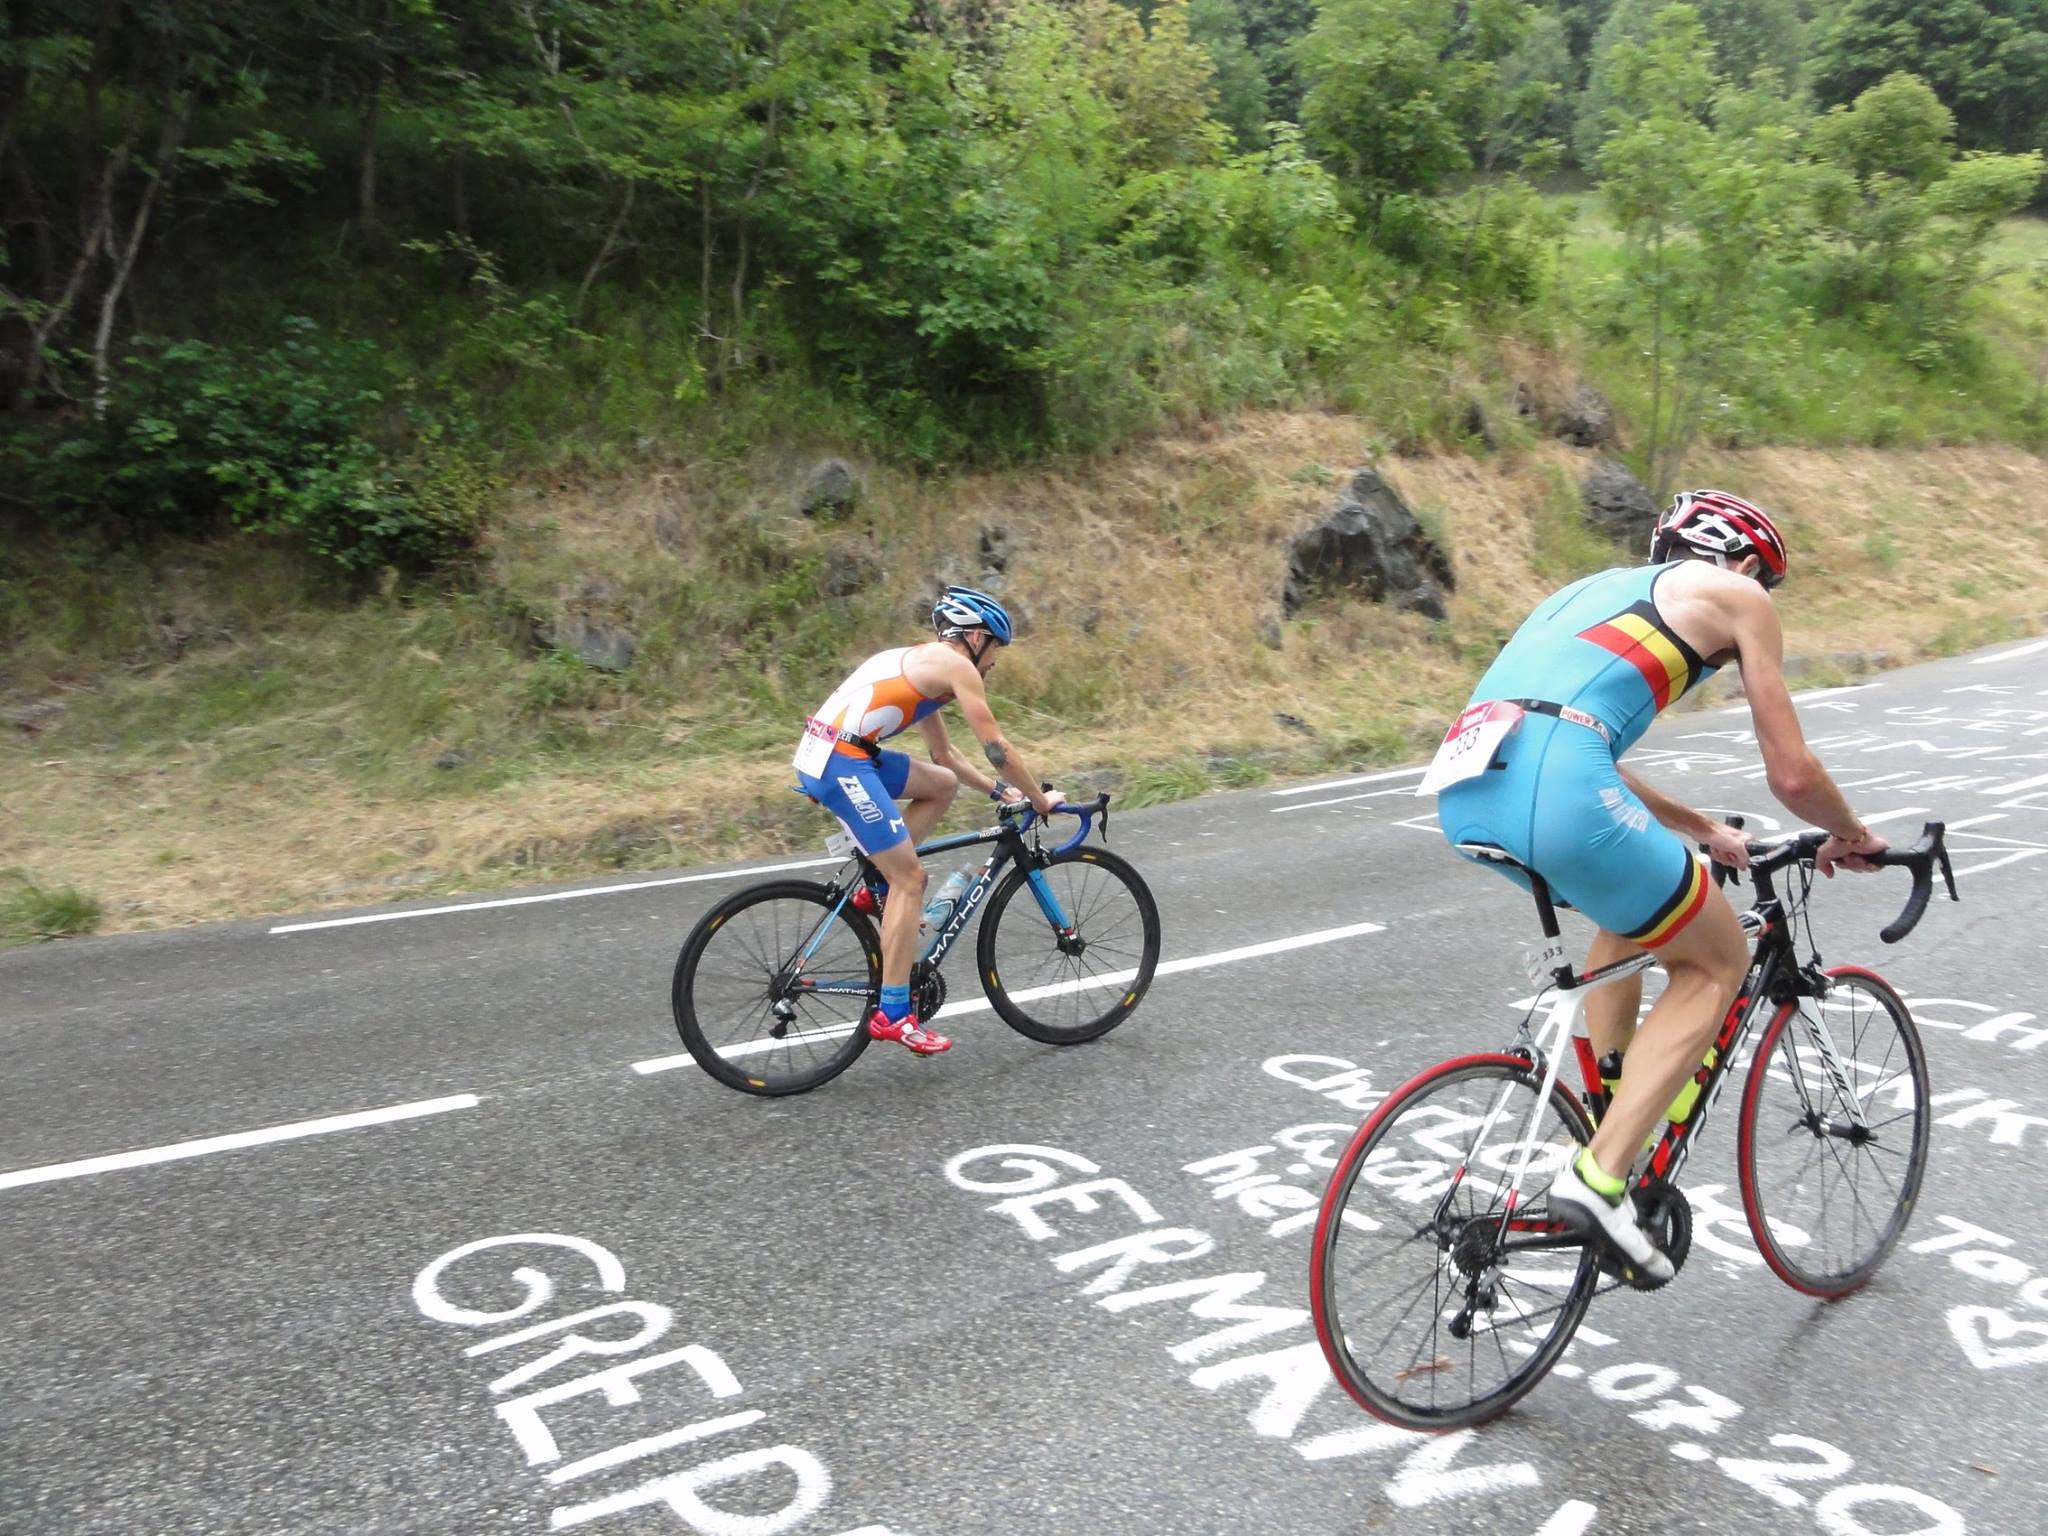 Jakke Petrol vijfde in Alpe d'Huez duatlon